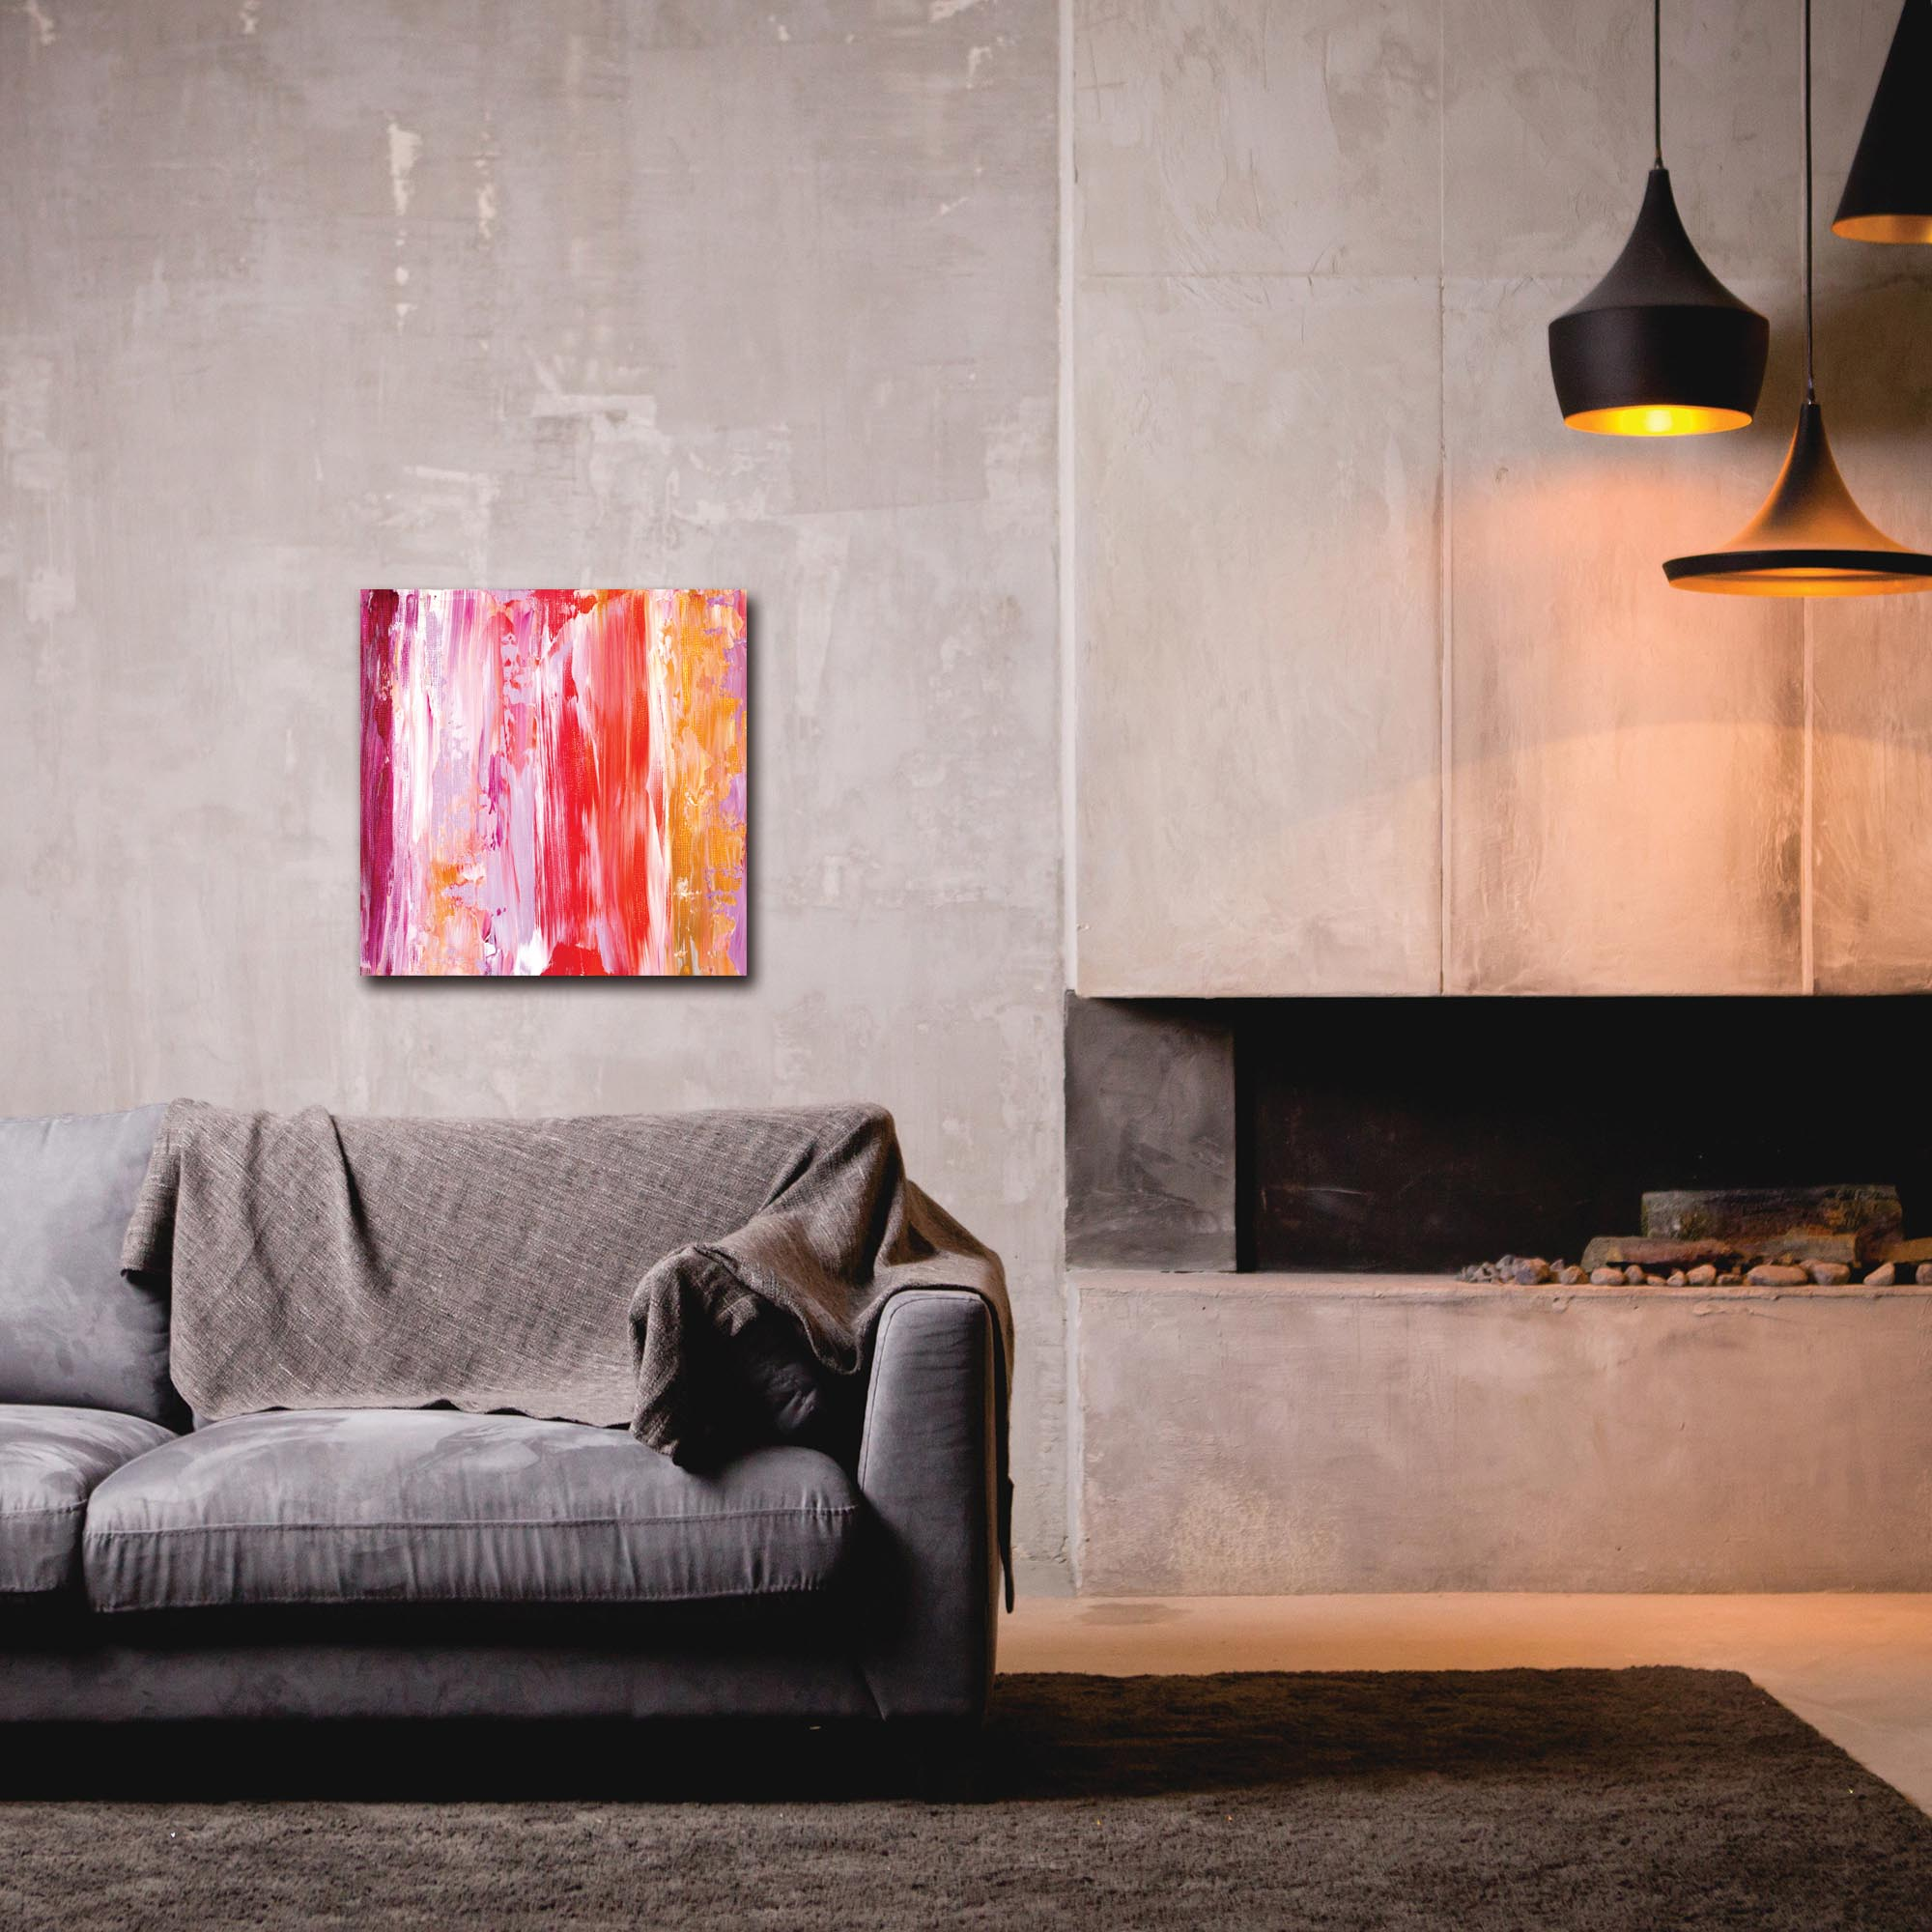 Abstract Wall Art 'Urban Life 4' - Urban Decor on Metal or Plexiglass - Lifestyle View